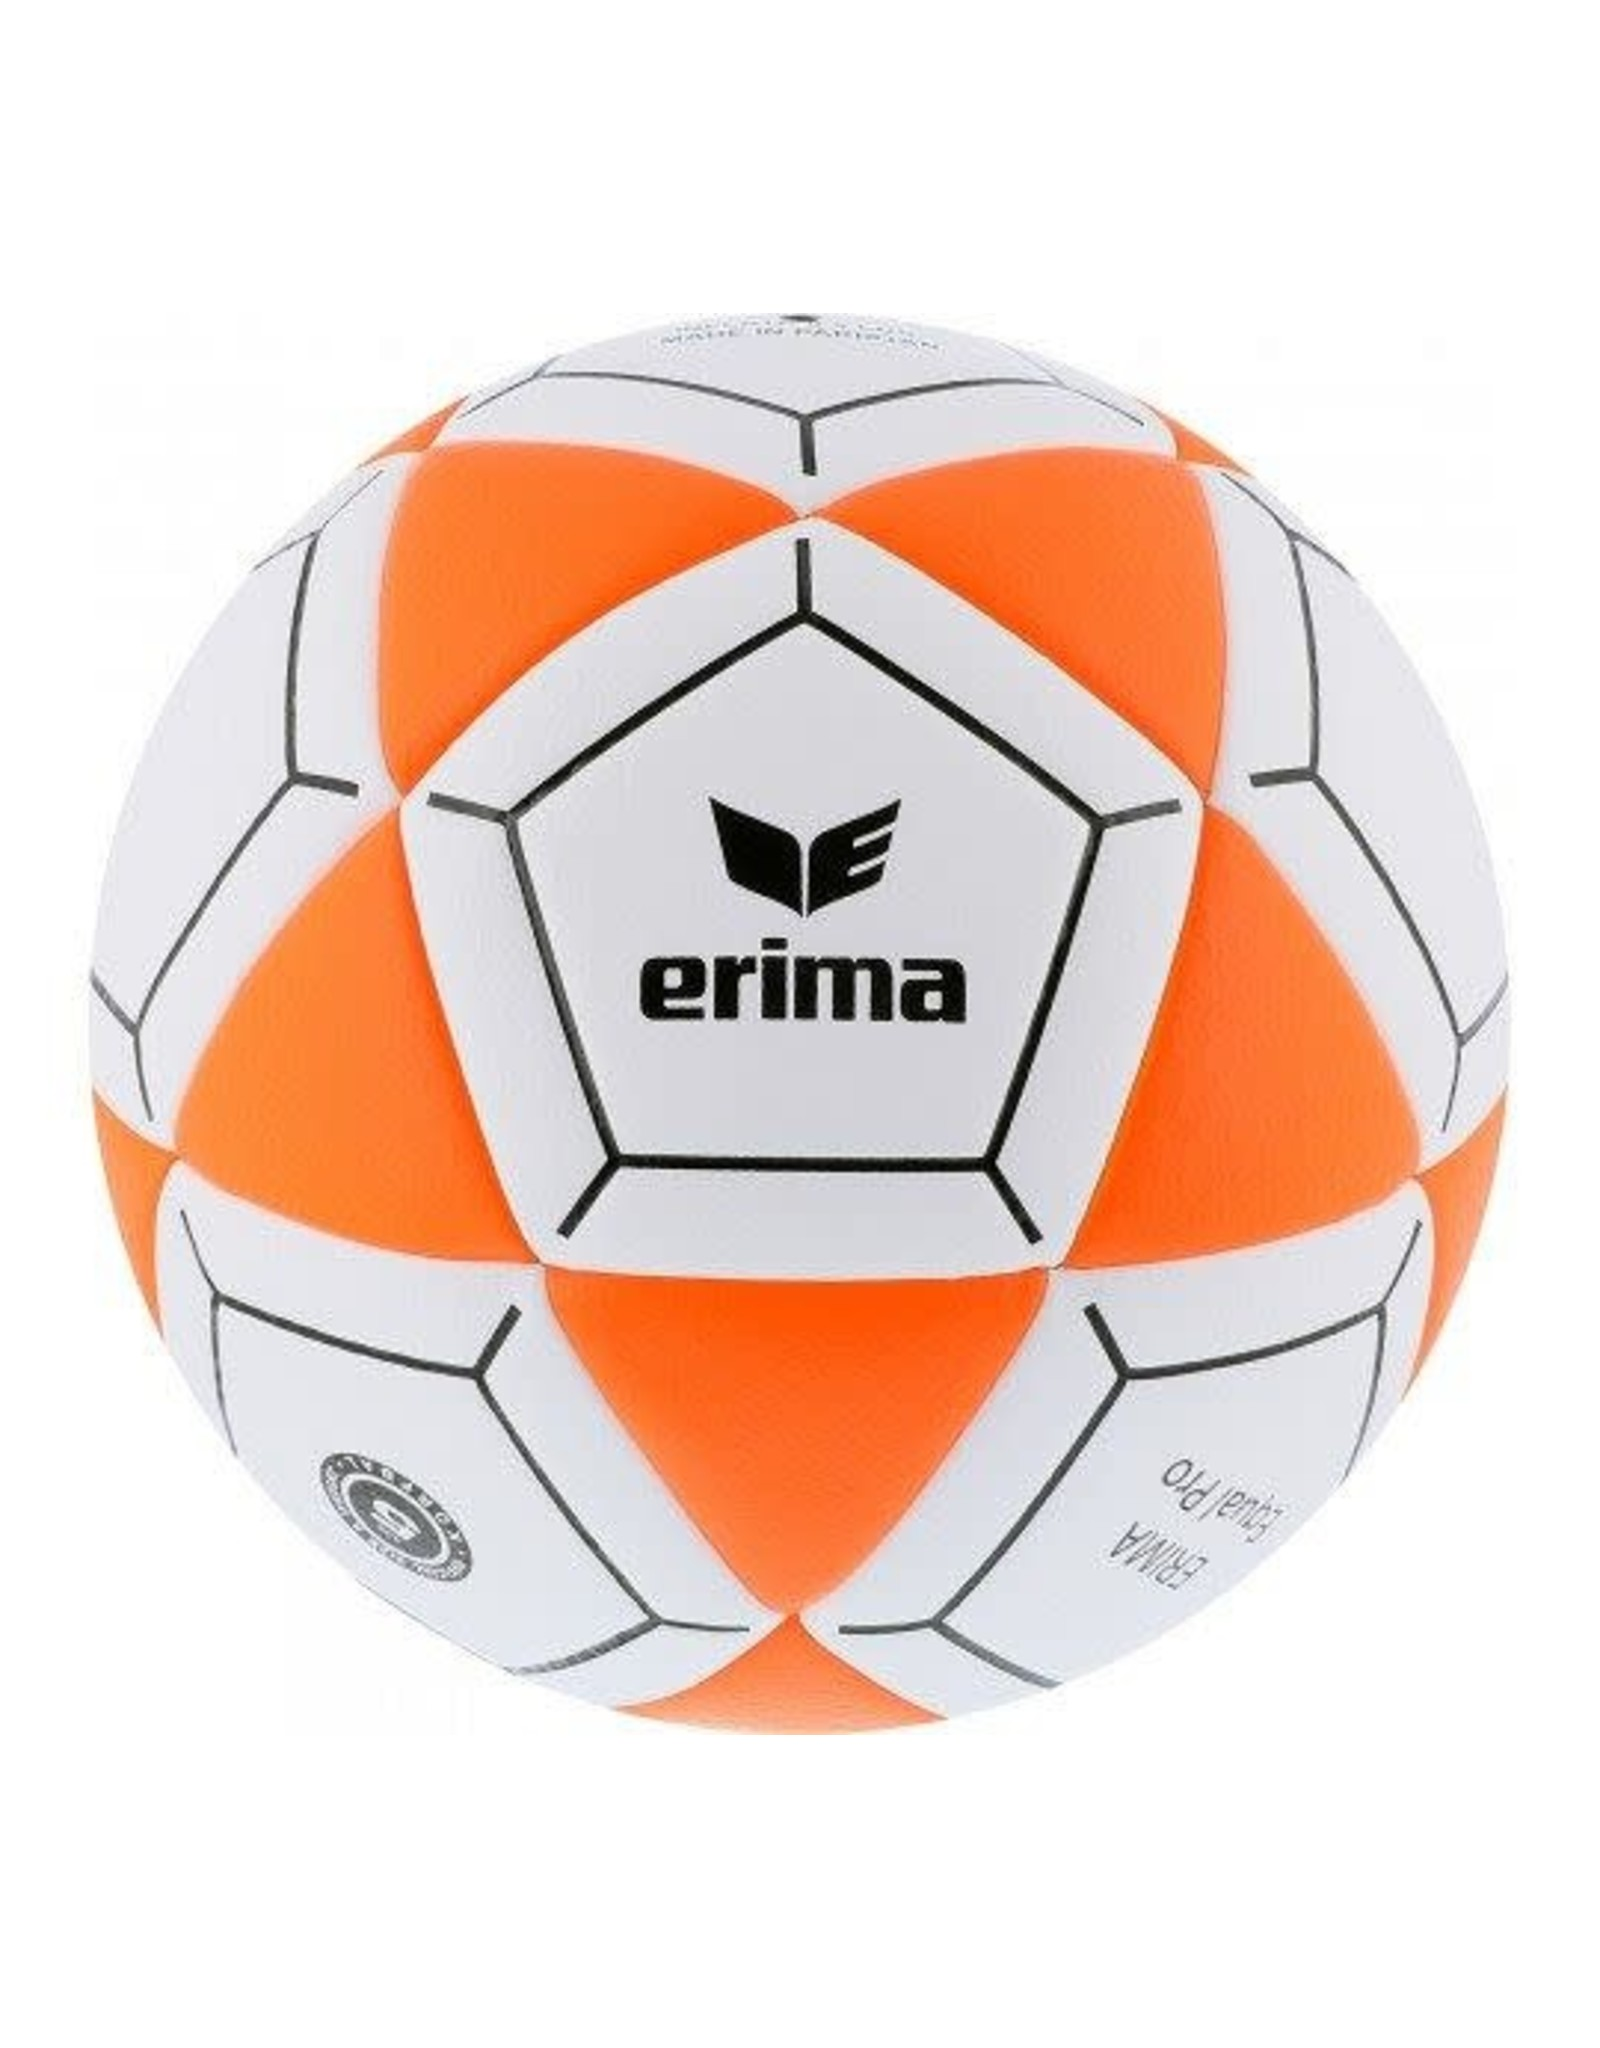 Erima Korfball Equal Pro